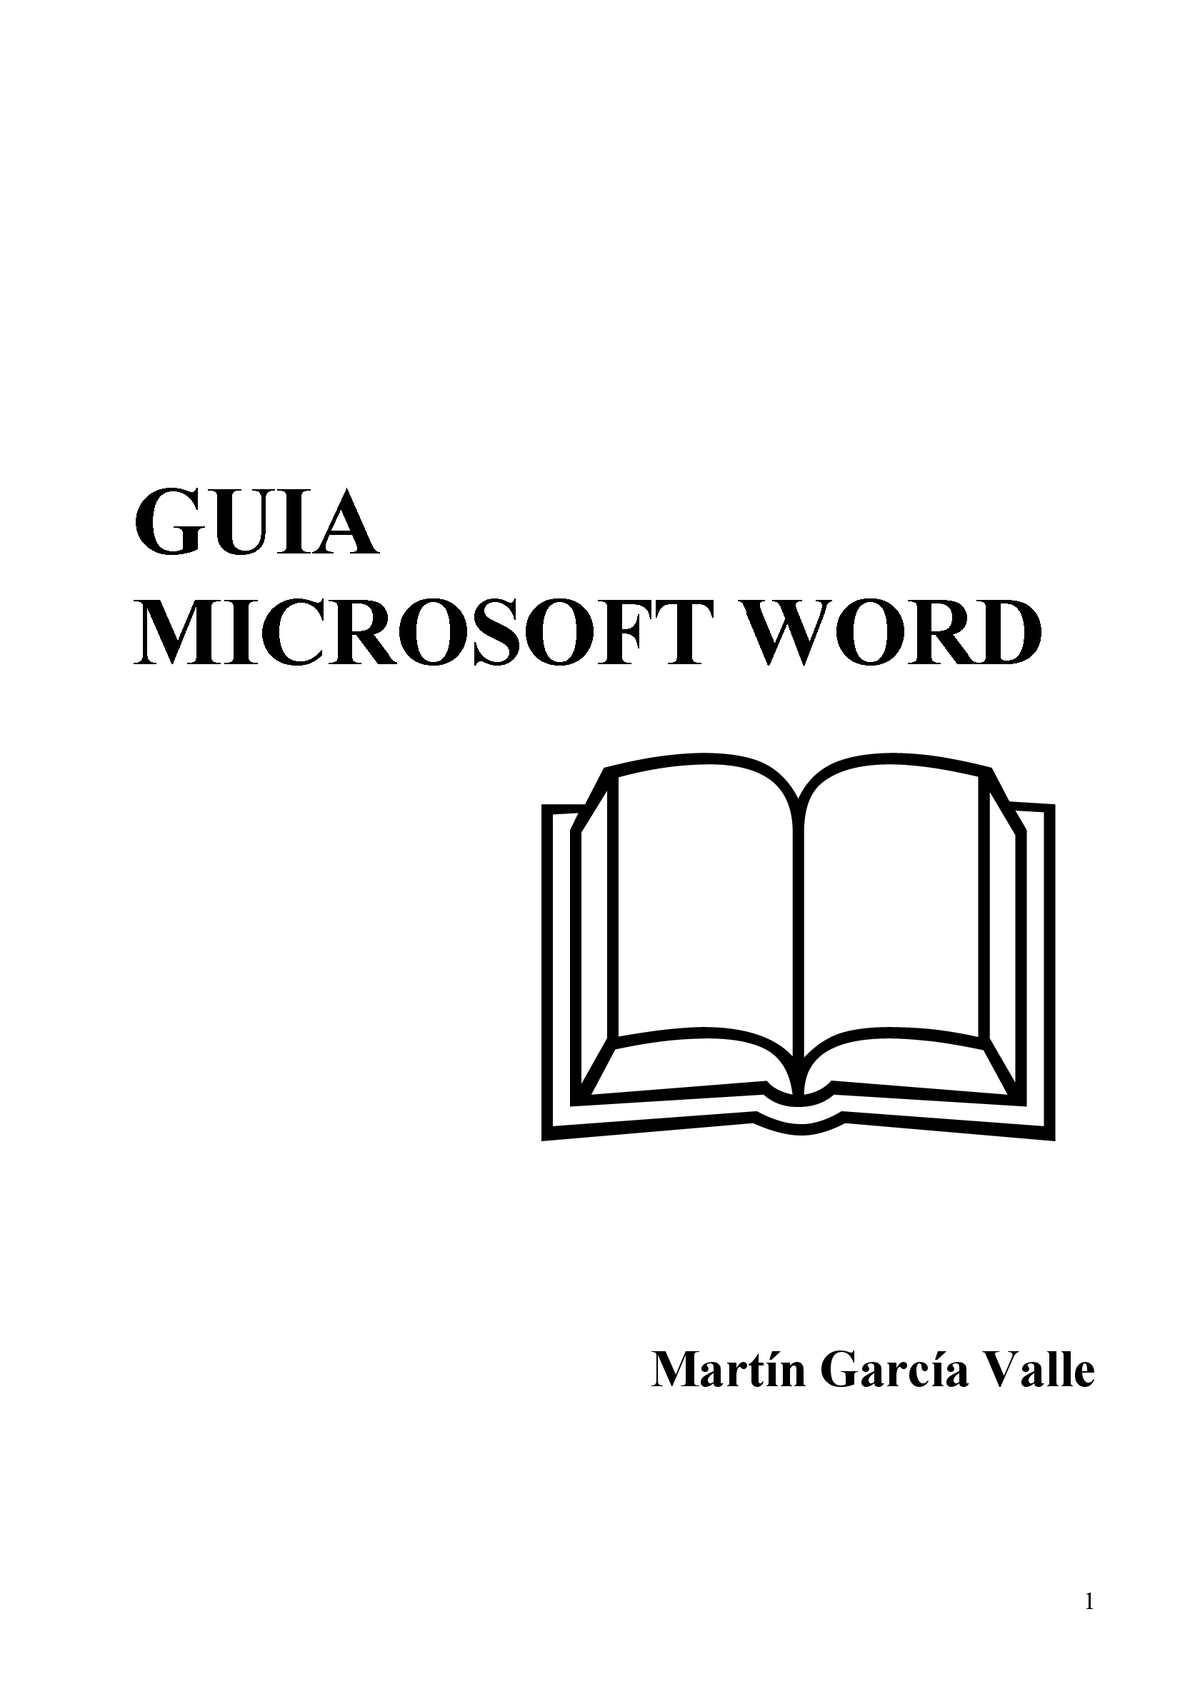 Calaméo - Word Martingv0910